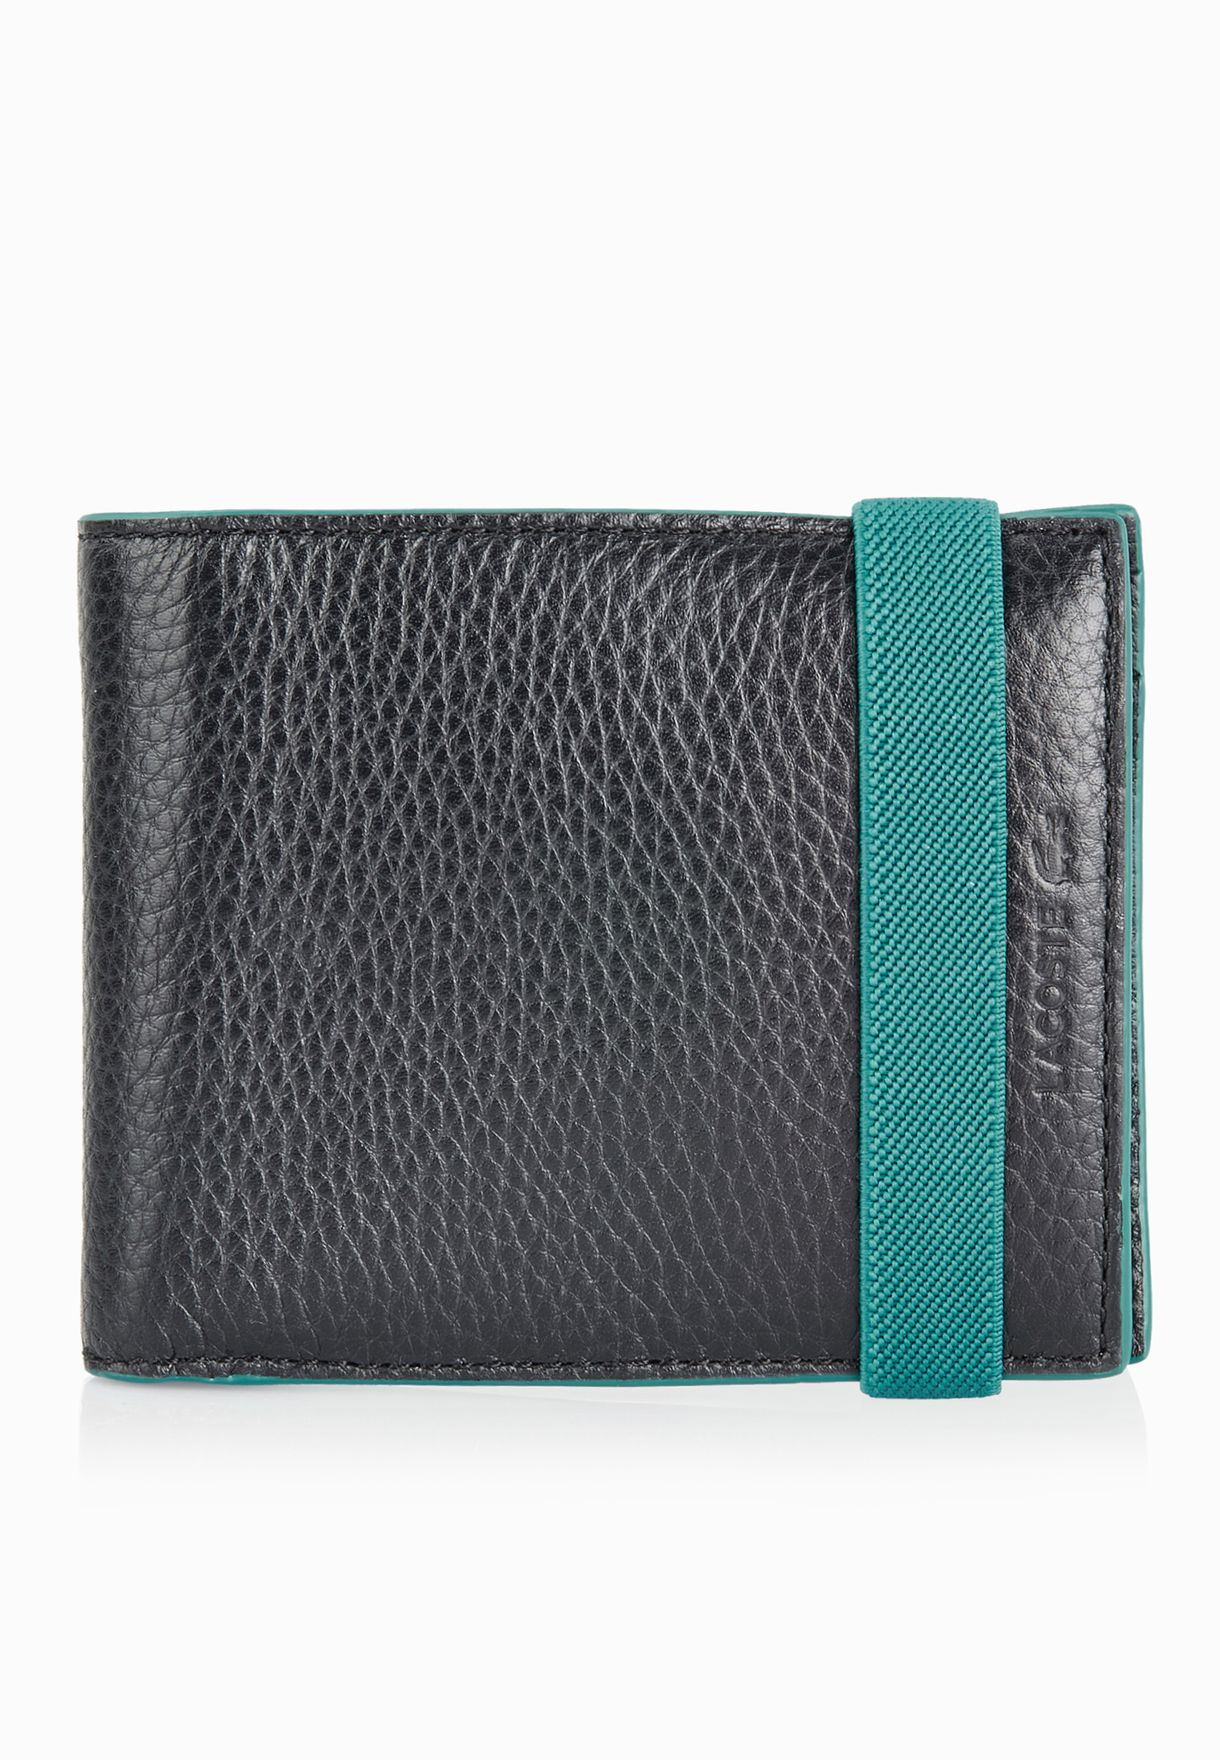 96b33868 Large Billfold Wallet